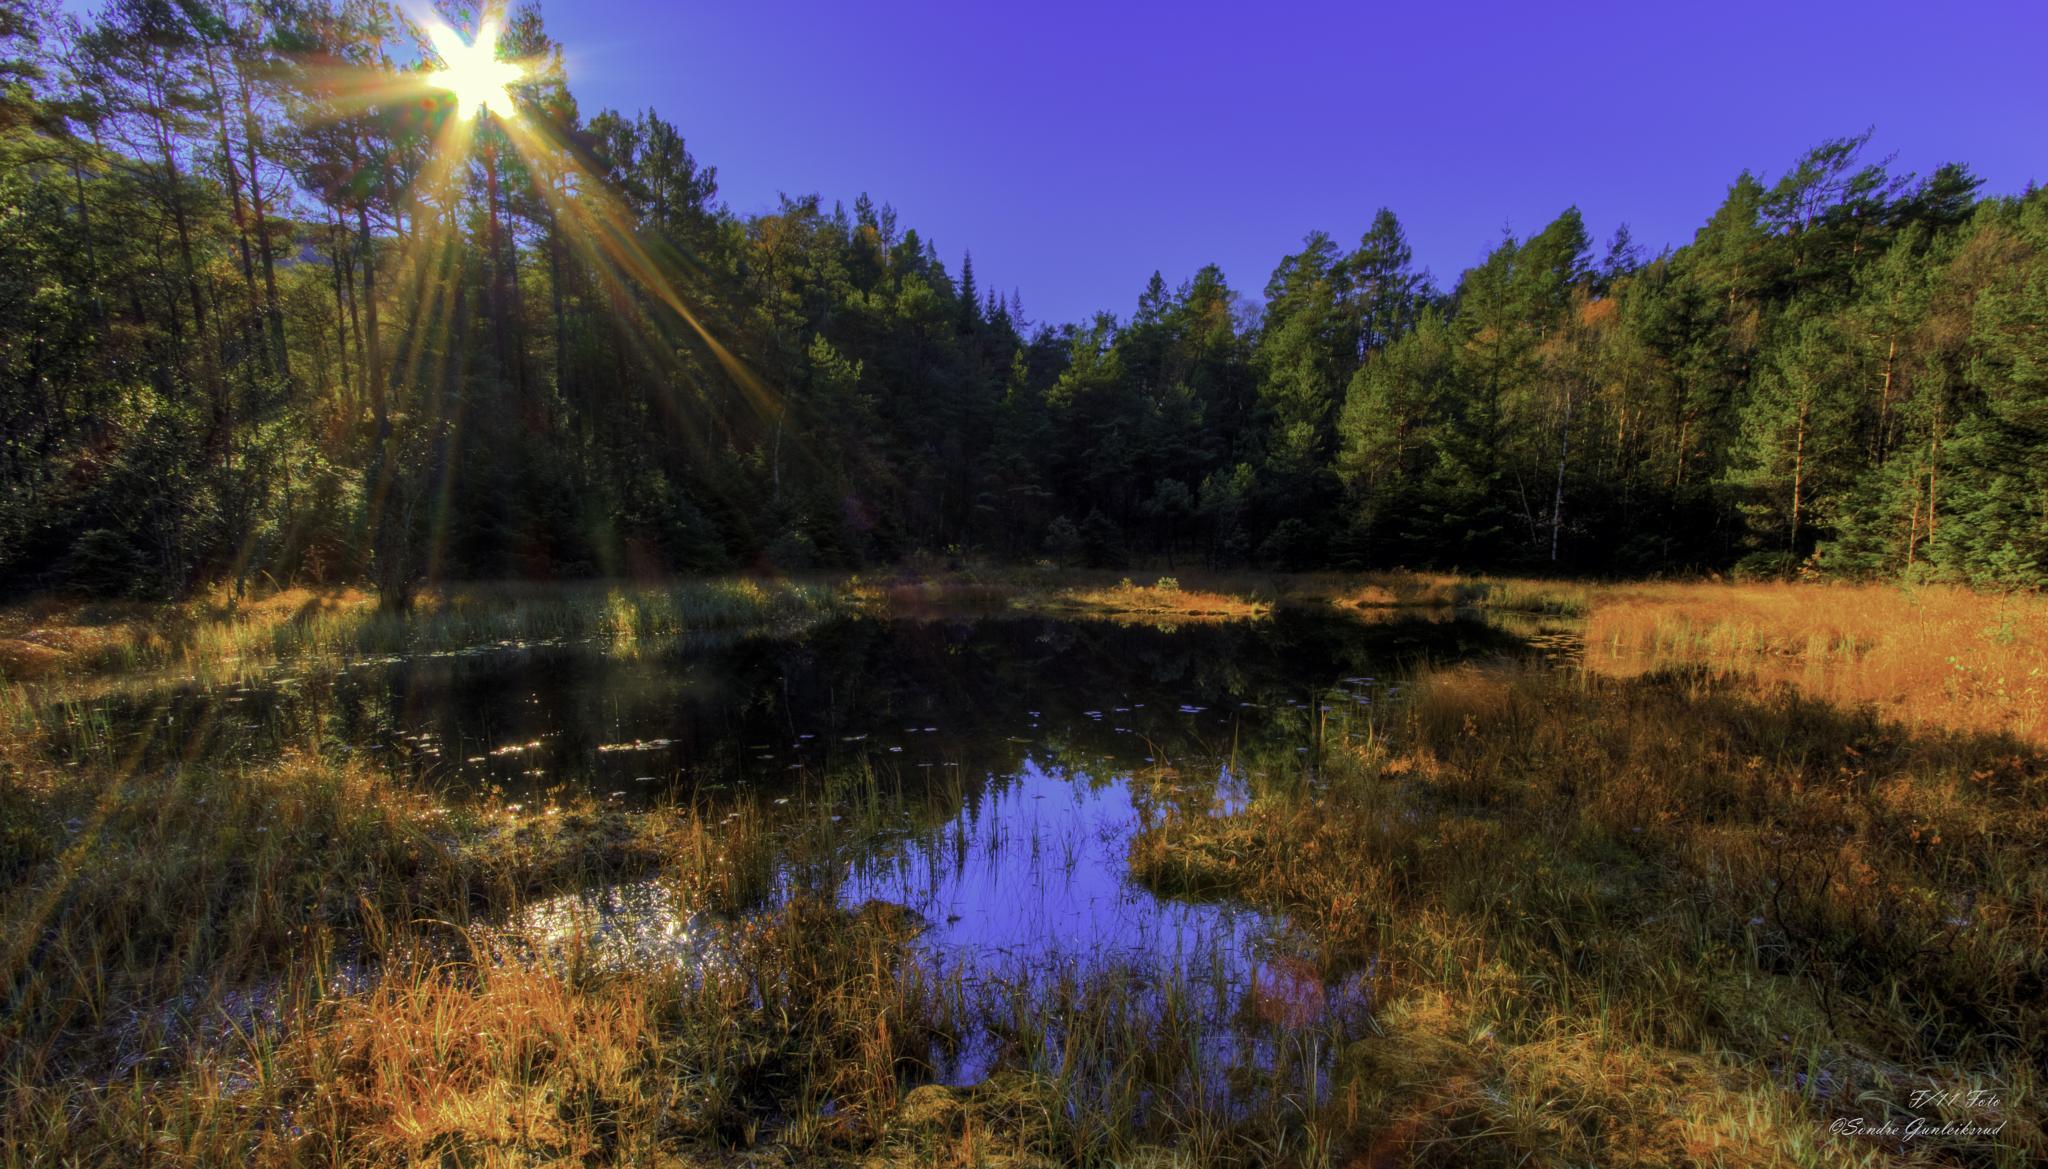 When the sun comes up by sondre.gunleiksrud